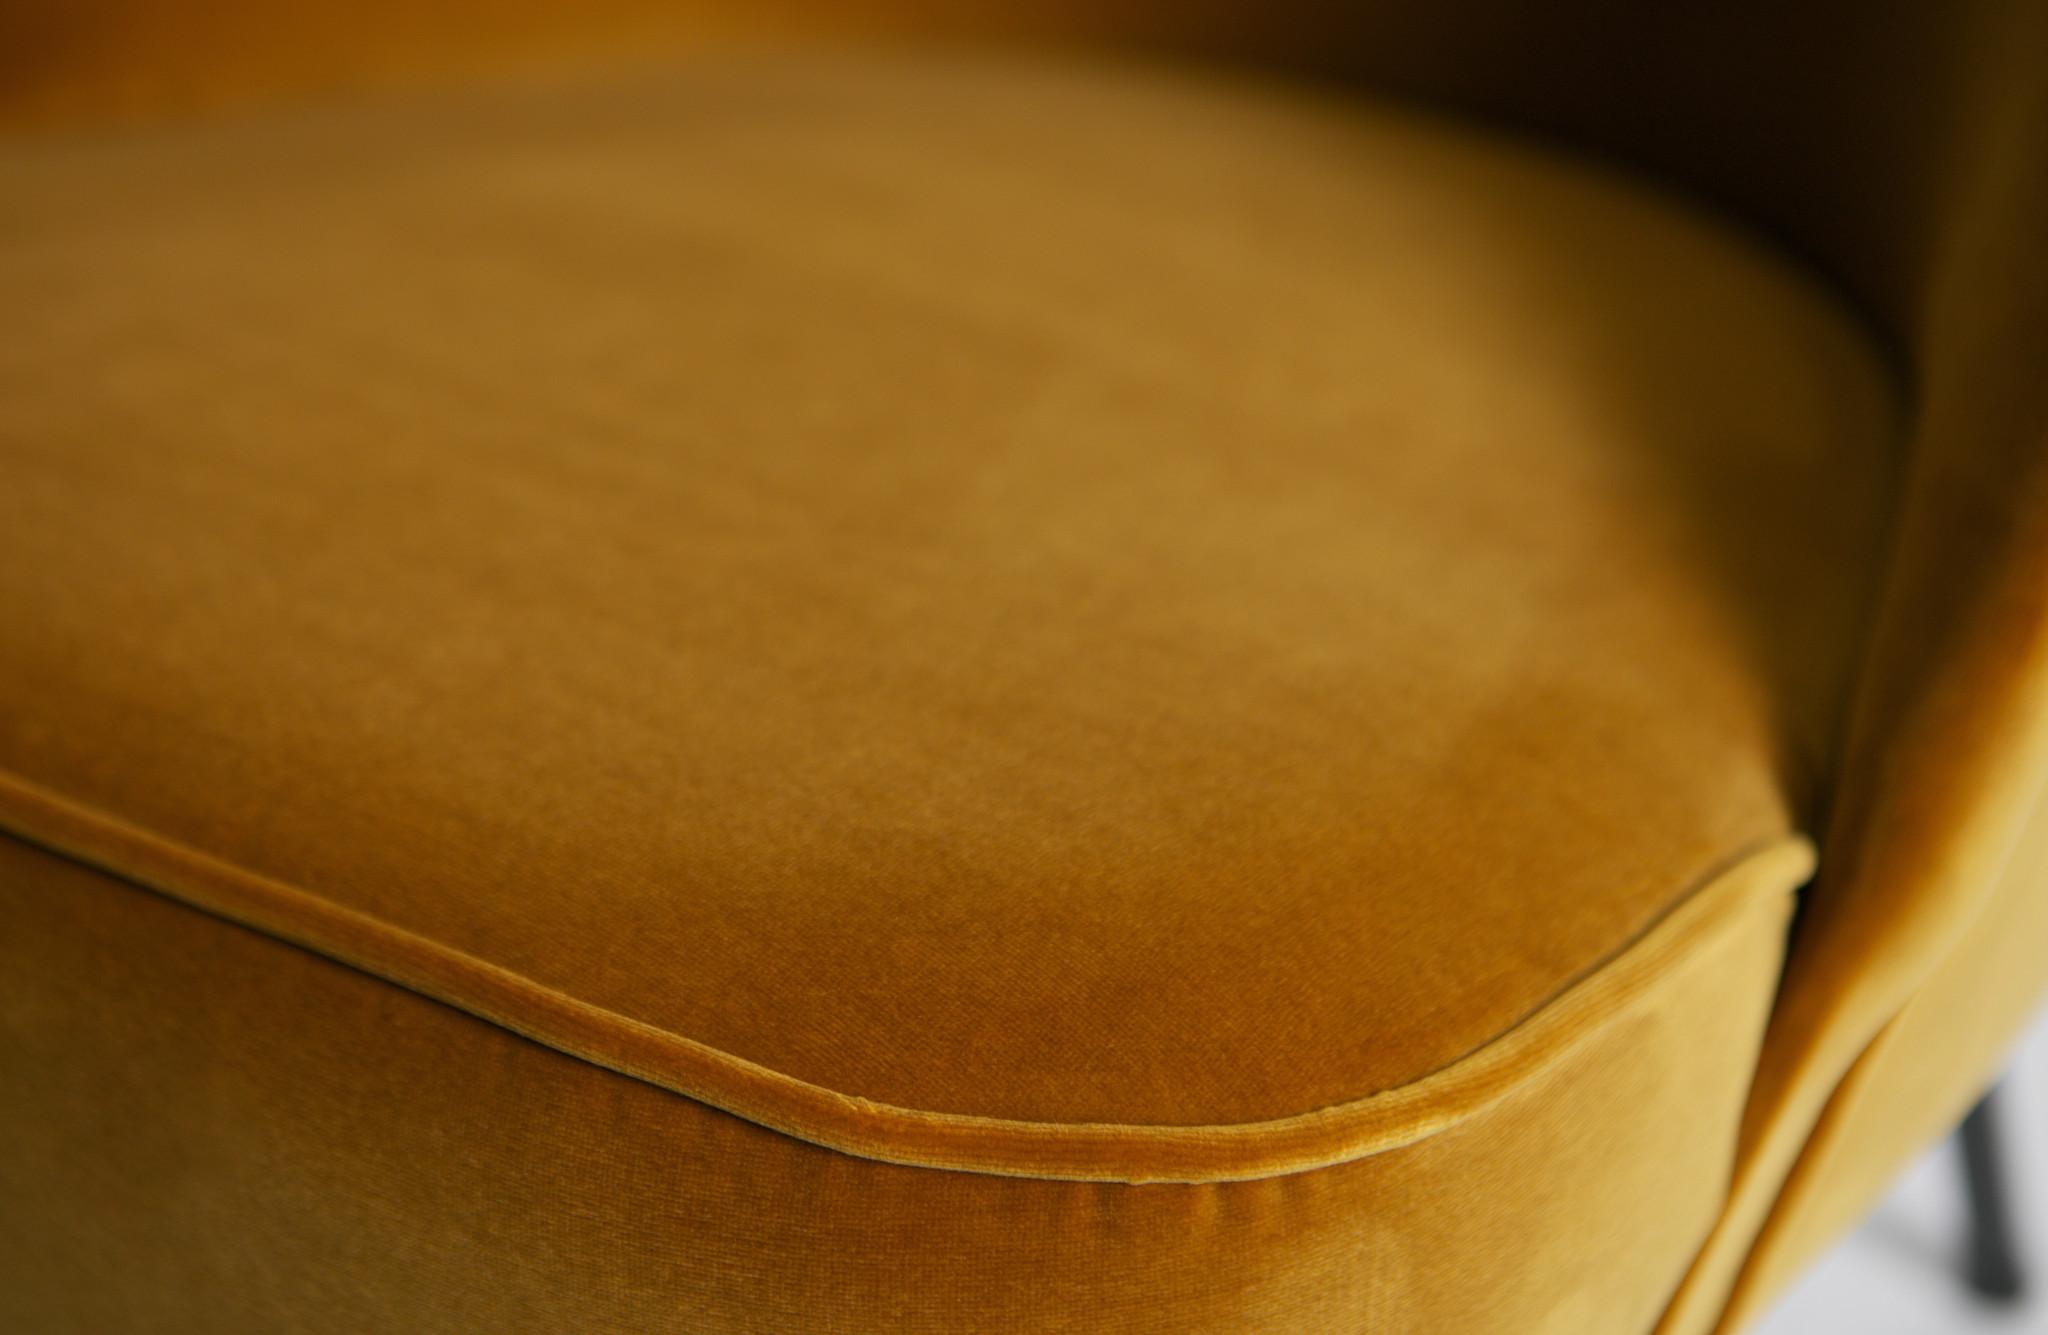 Vogue fauteuil mosterd velvet detail